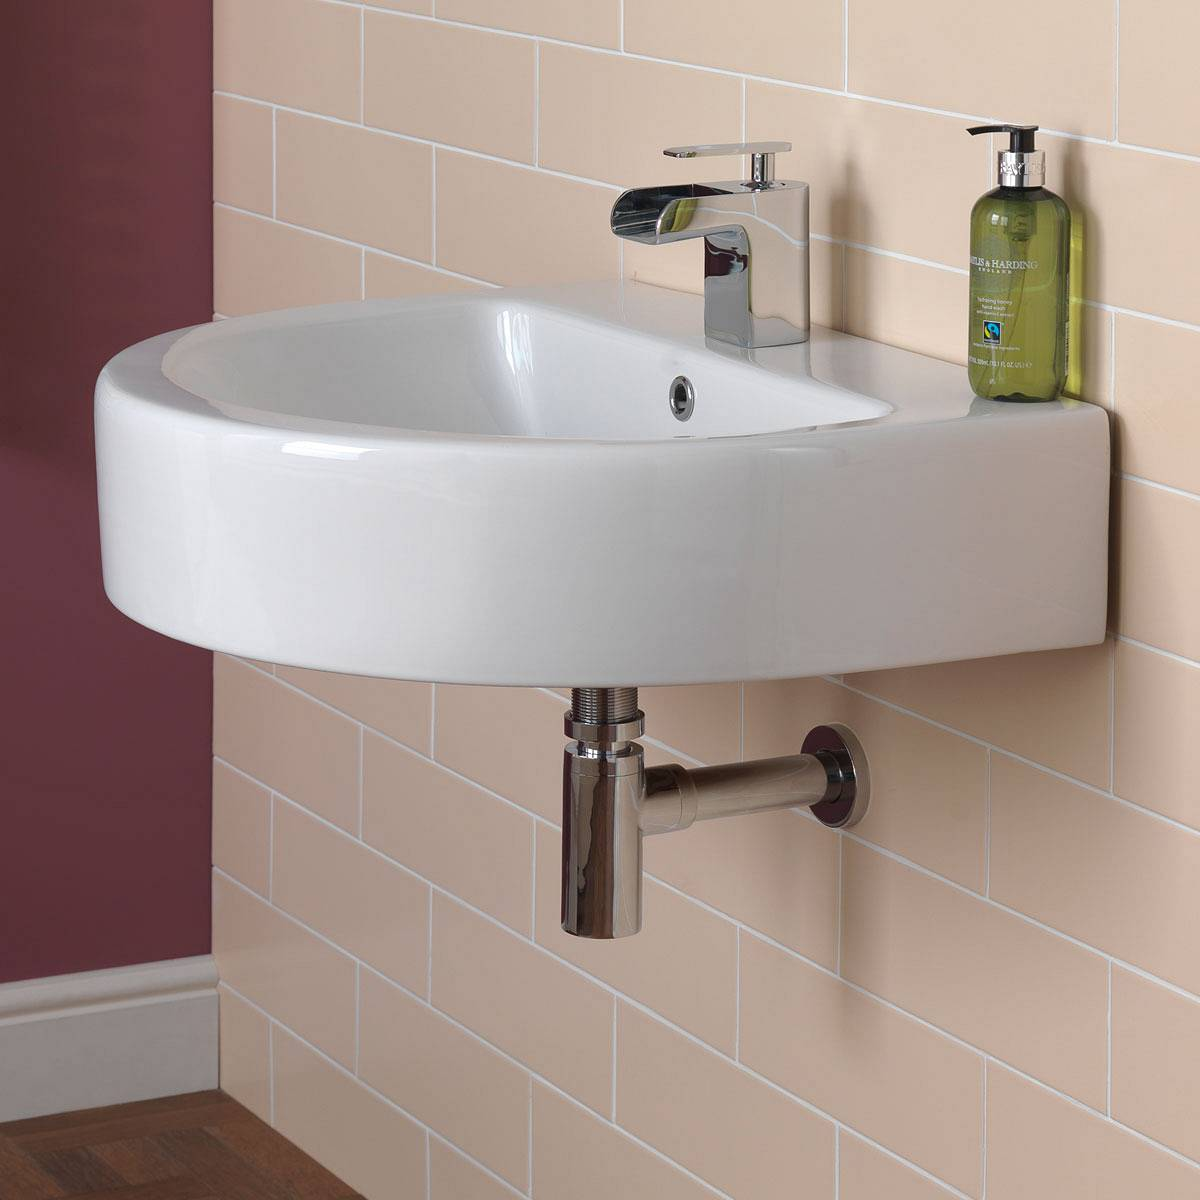 Bathroom Drain Plumbing Minimalist minimalist chrome brass round bottle trap waste bathroom basin